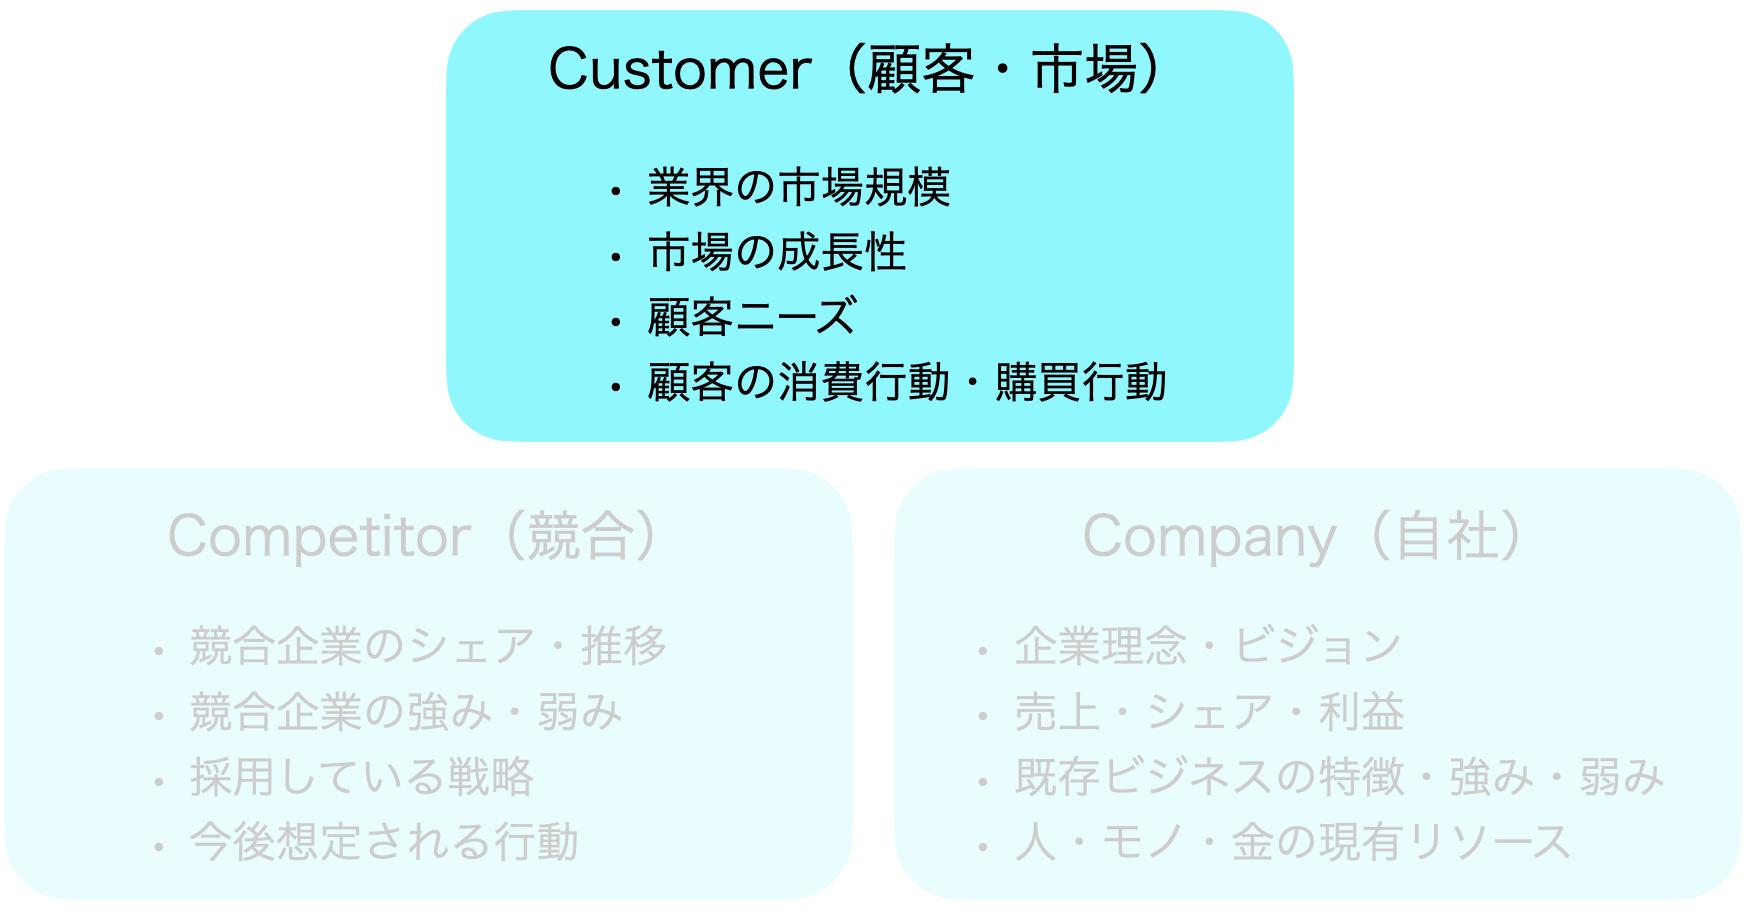 3C分析、Customer(顧客・市場)分析